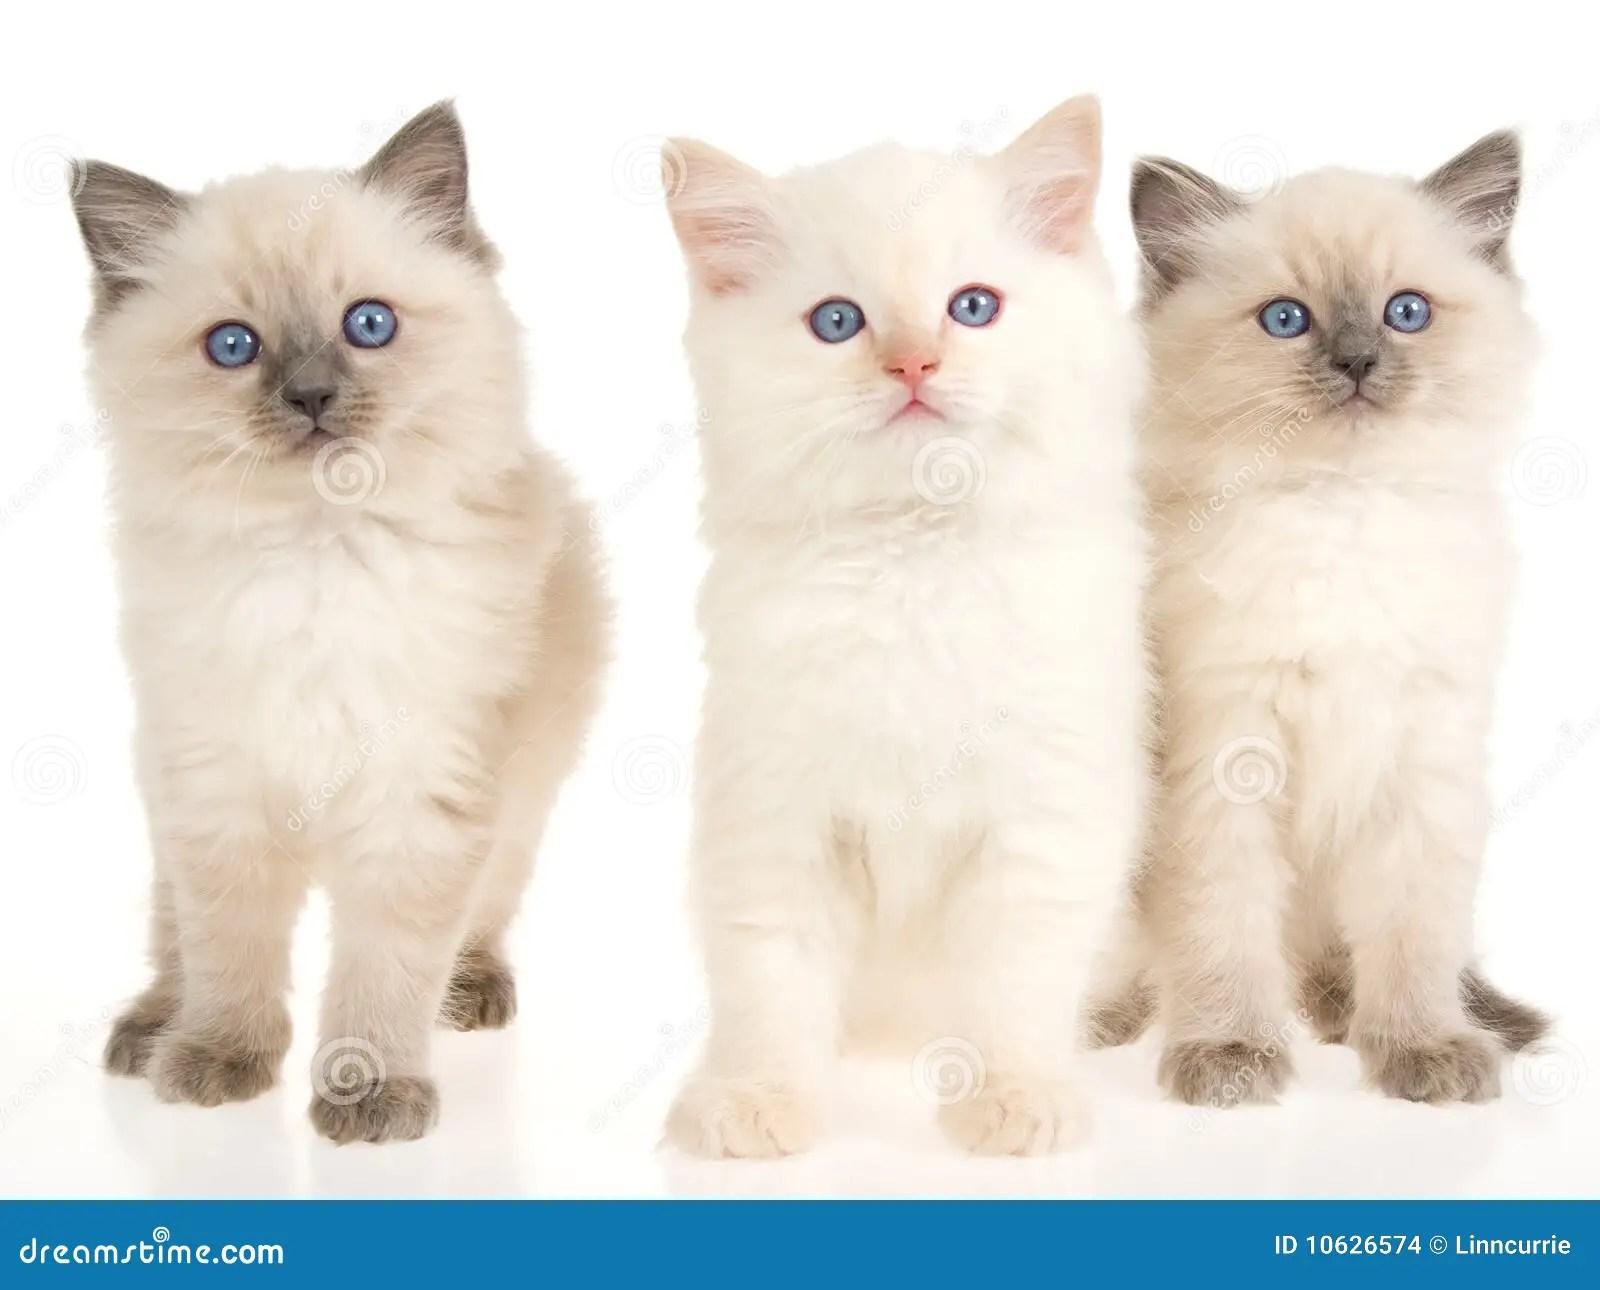 Cute White Kittens With Blue Eyes Wallpaper 3 Gatinhos De Ragdoll No Fundo Branco Imagens De Stock